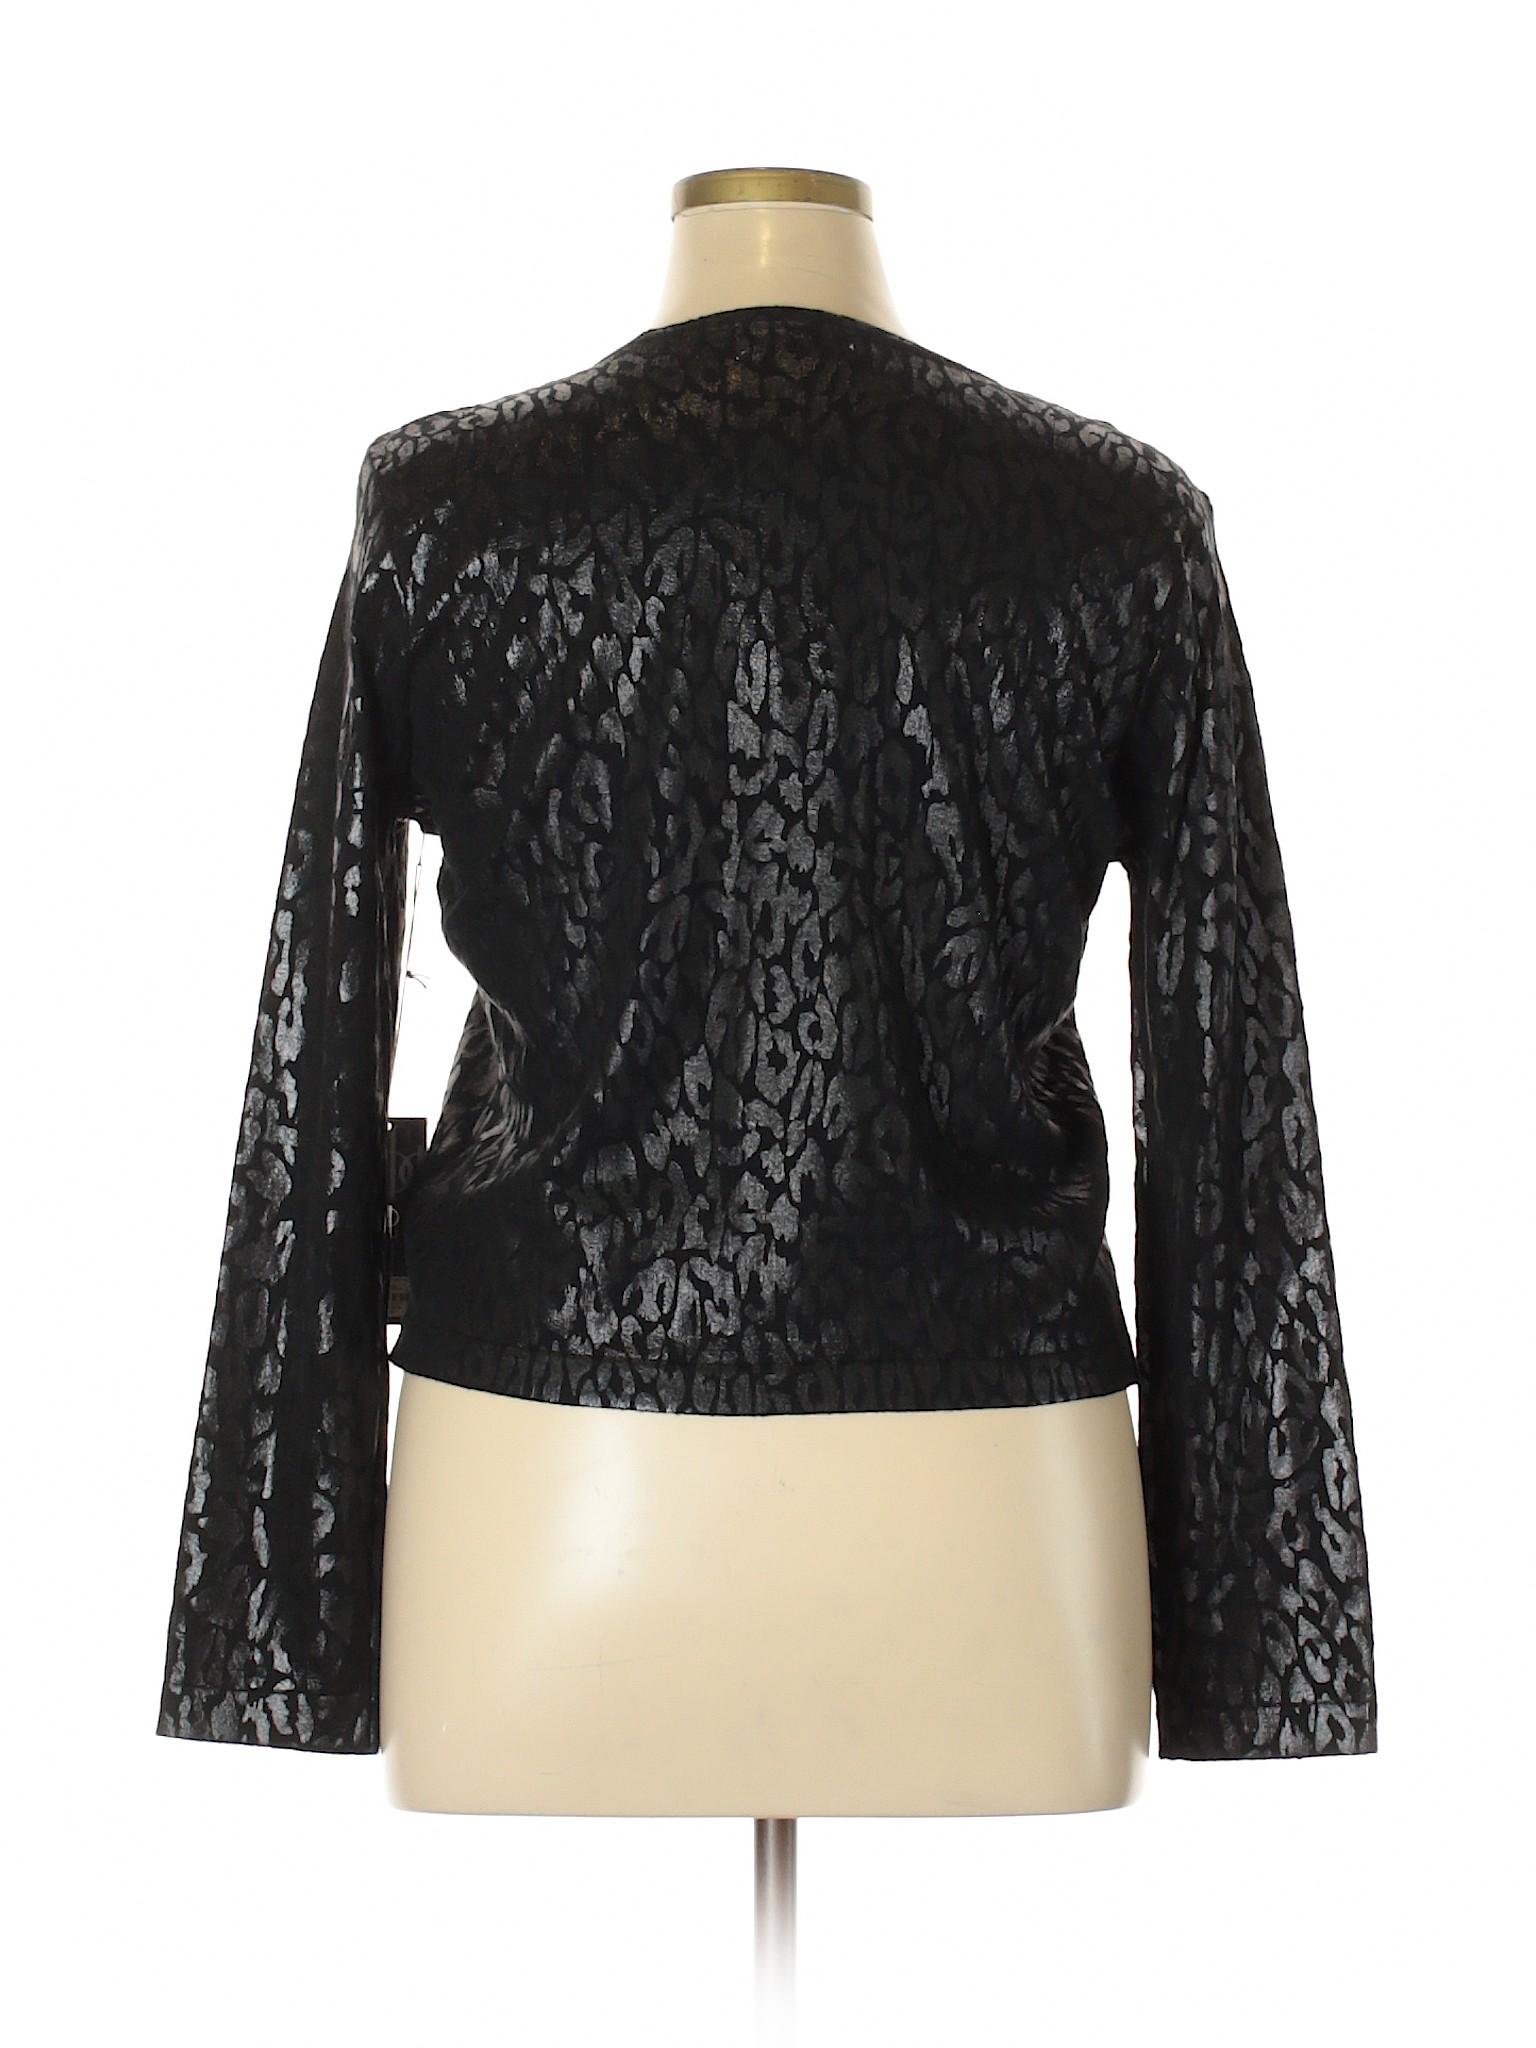 Lopez Sweater Pullover Jennifer Sweater Lopez Boutique Pullover Lopez Jennifer Boutique Pullover Jennifer Boutique wxqZBgqC